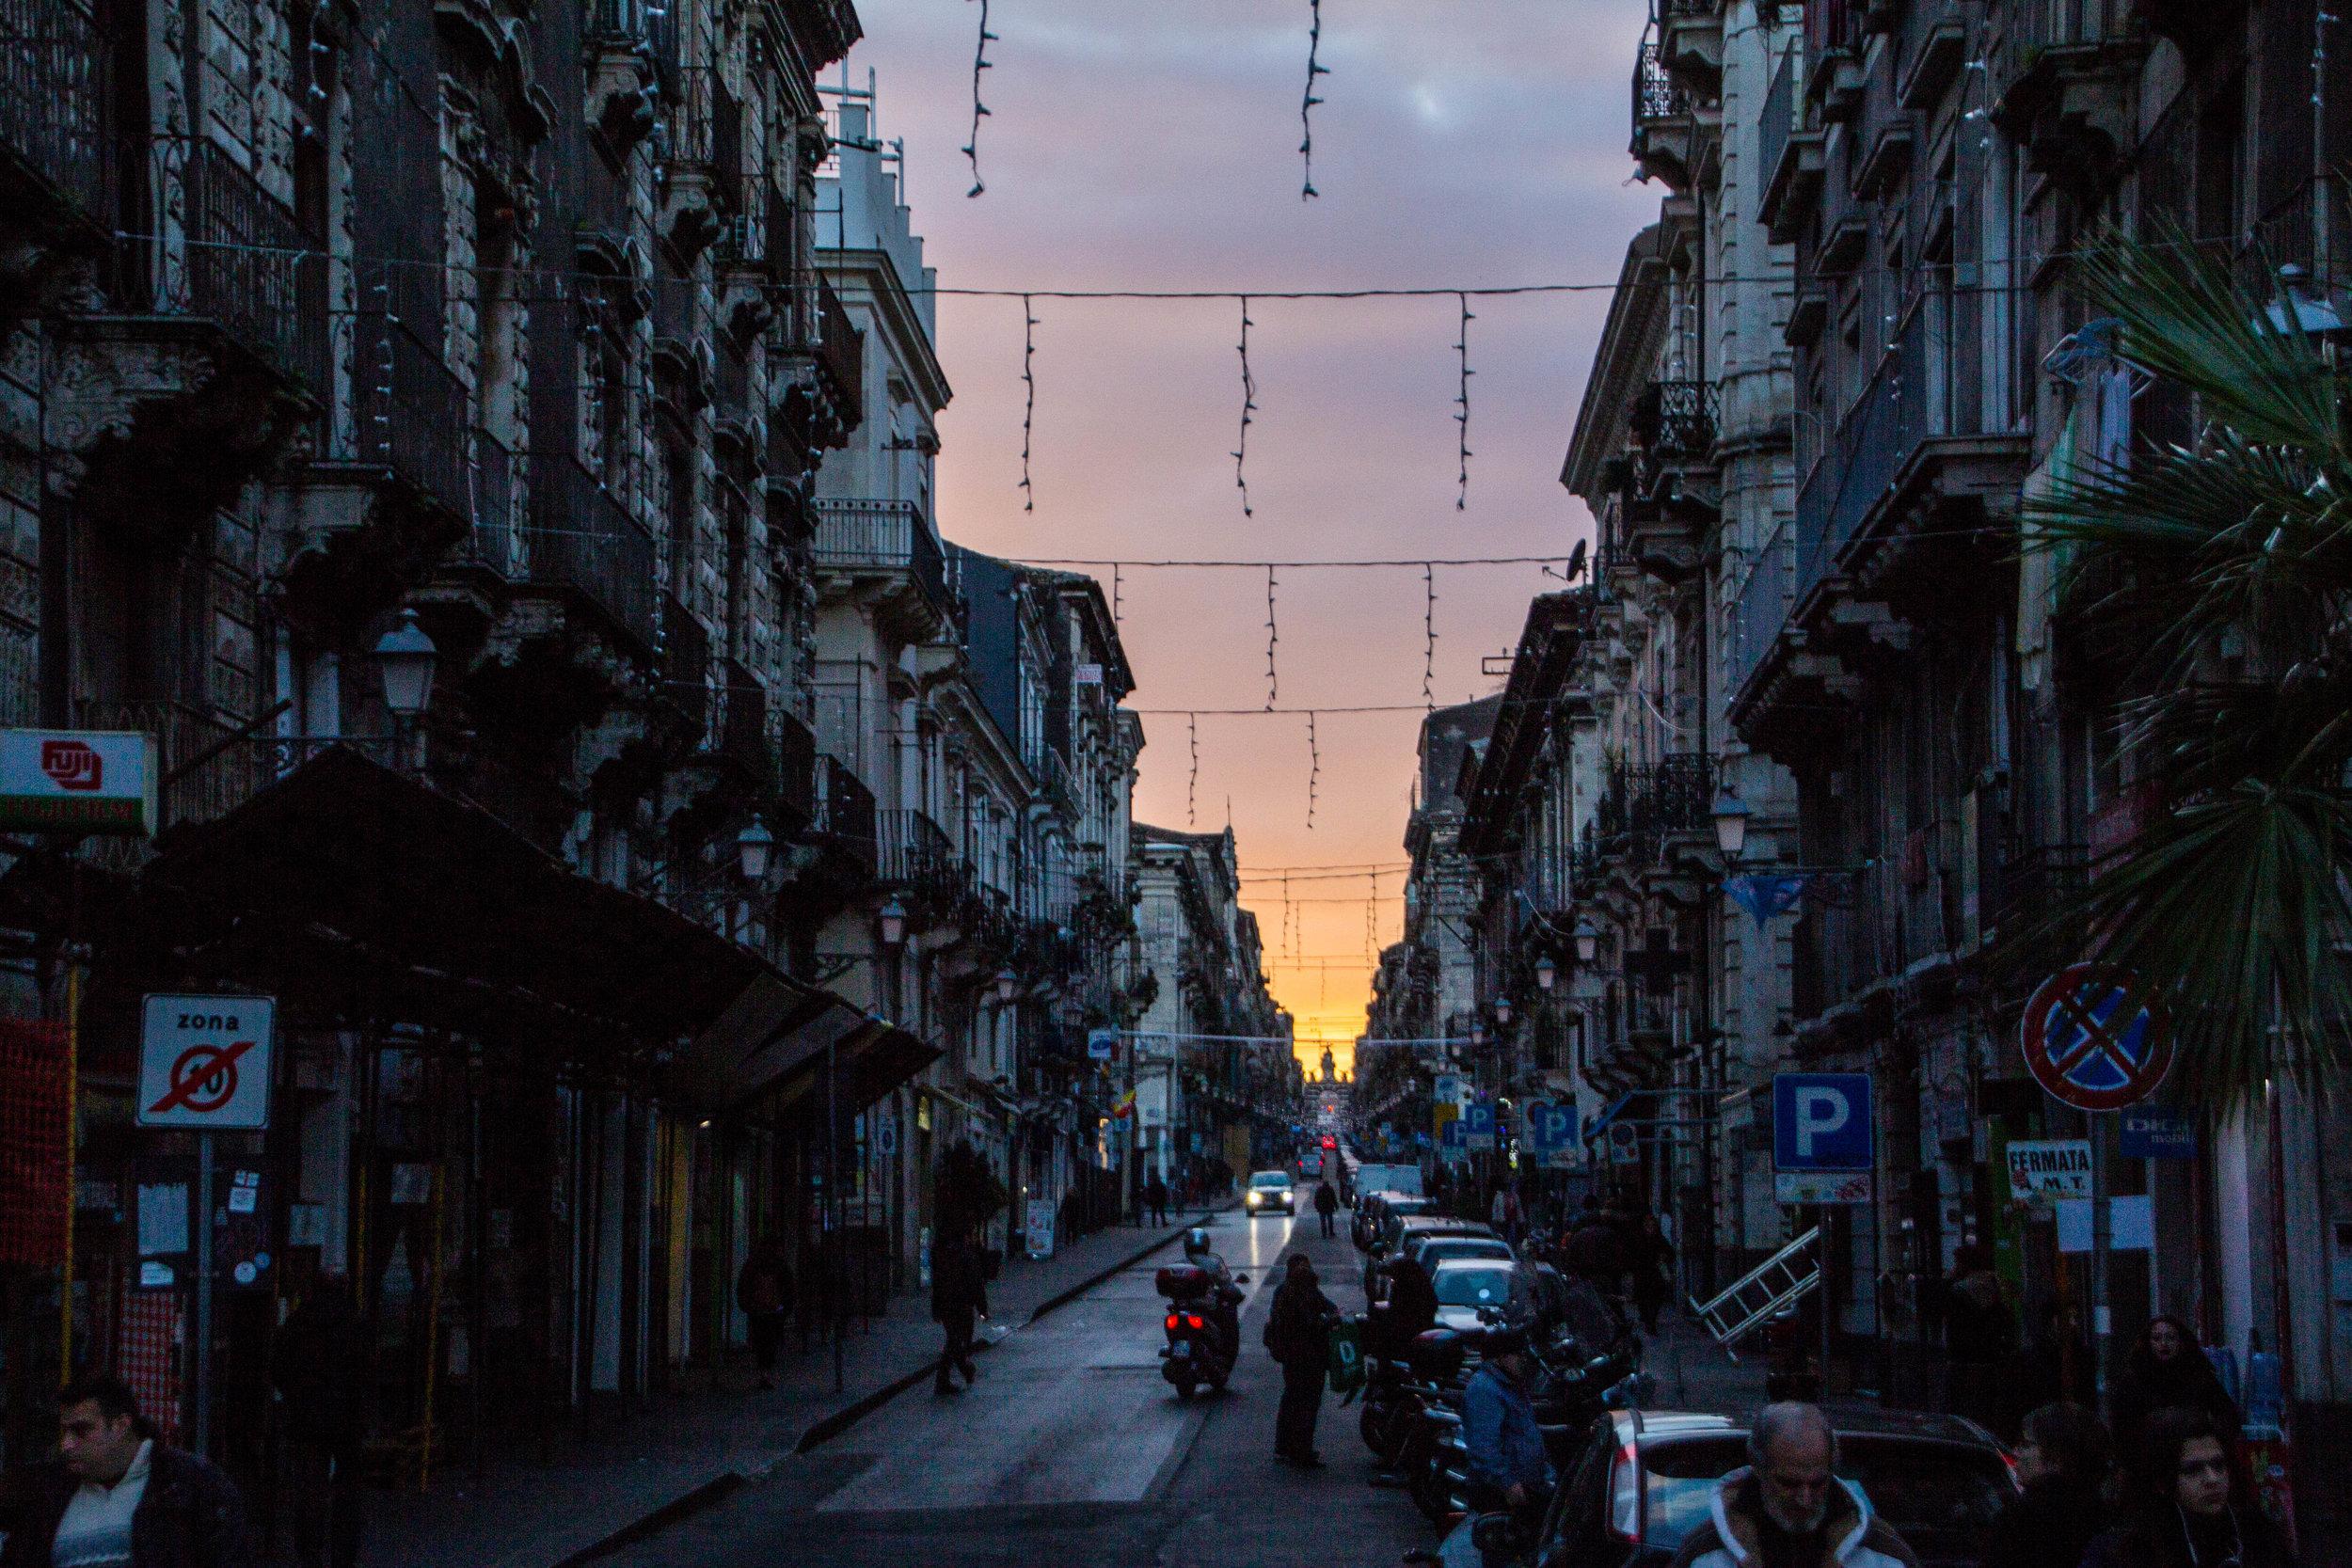 streets-catania-sicily-sicilia-29.jpg